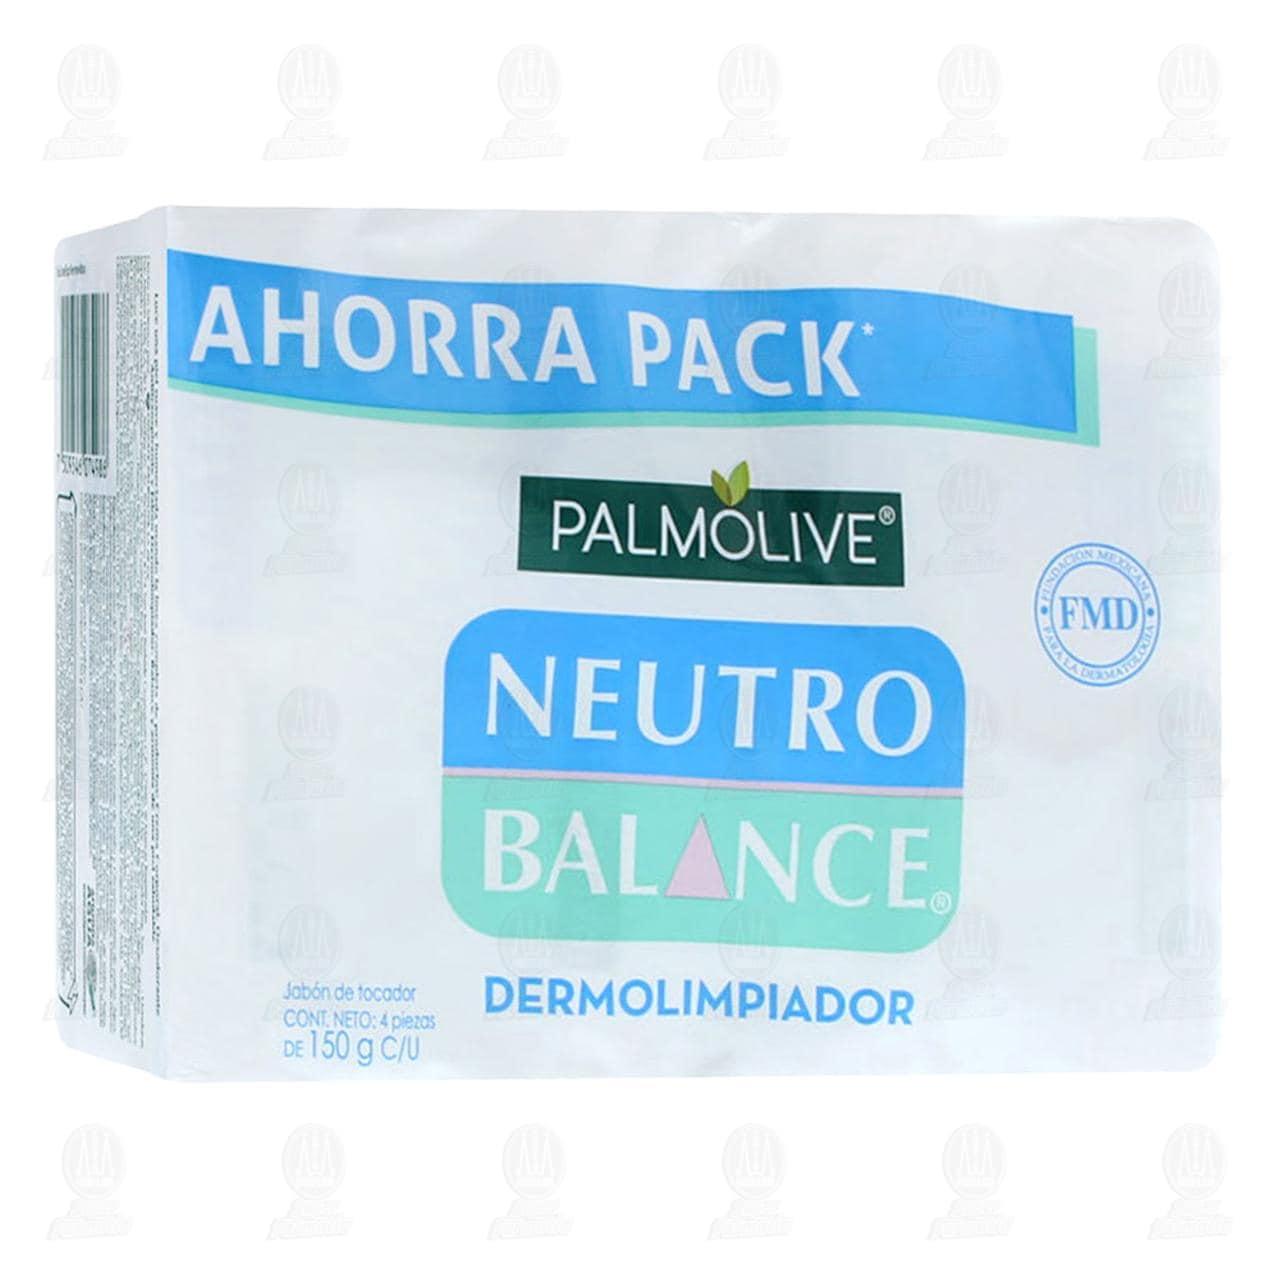 Jabón en Barra Palmolive Neutro Balance dermo Limpiador, 4 pzas. 150 gr.